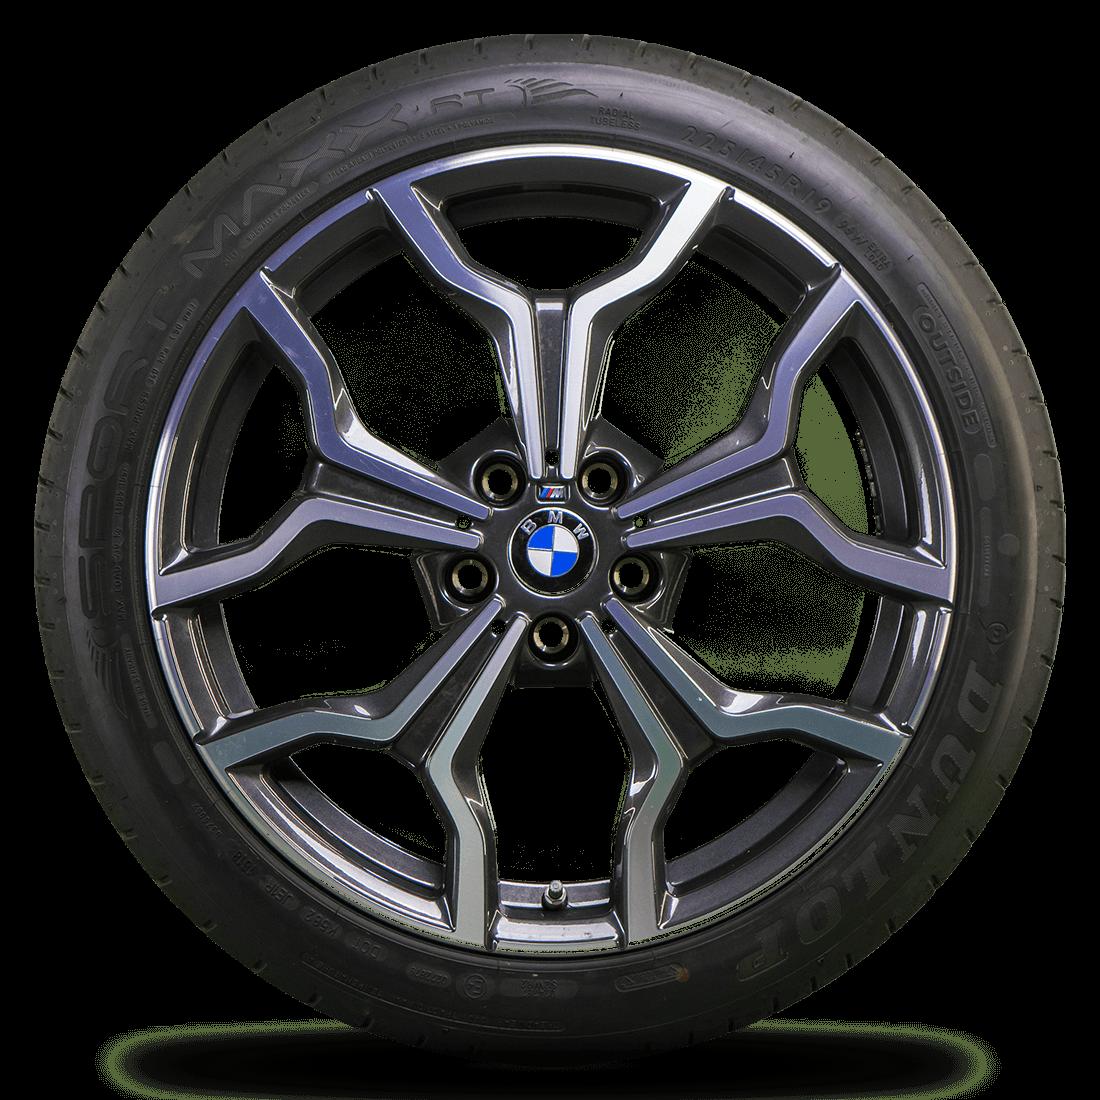 Bmw 19 Inch Rims X2 F39 Alloy Wheels Summer Tires Summer Wheels Styling M722 New